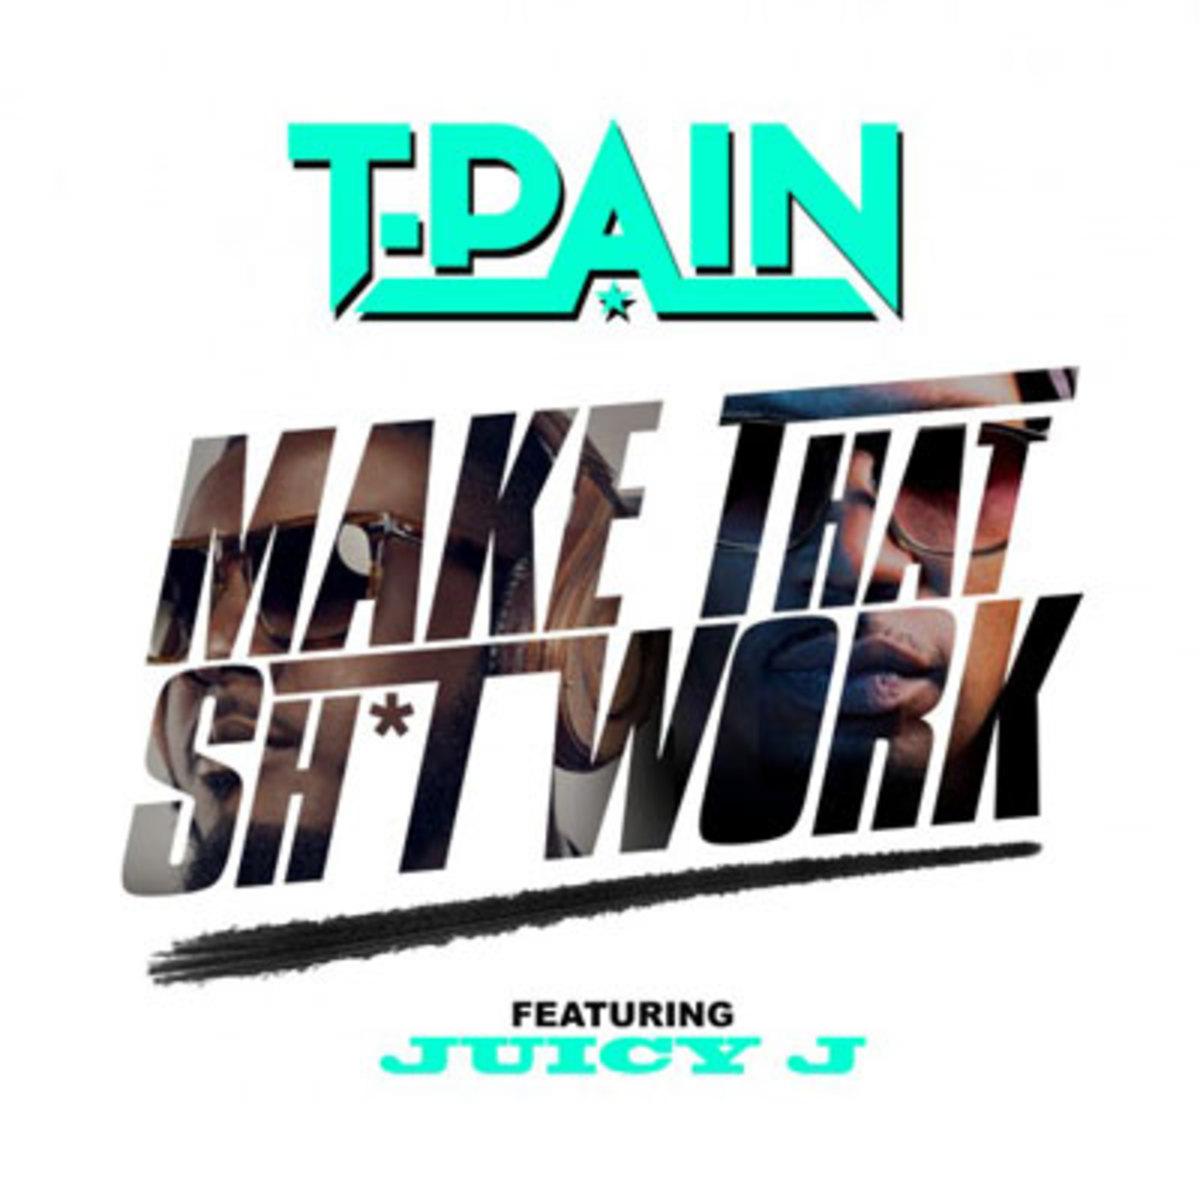 t-pain-make-that-sht-work.jpg